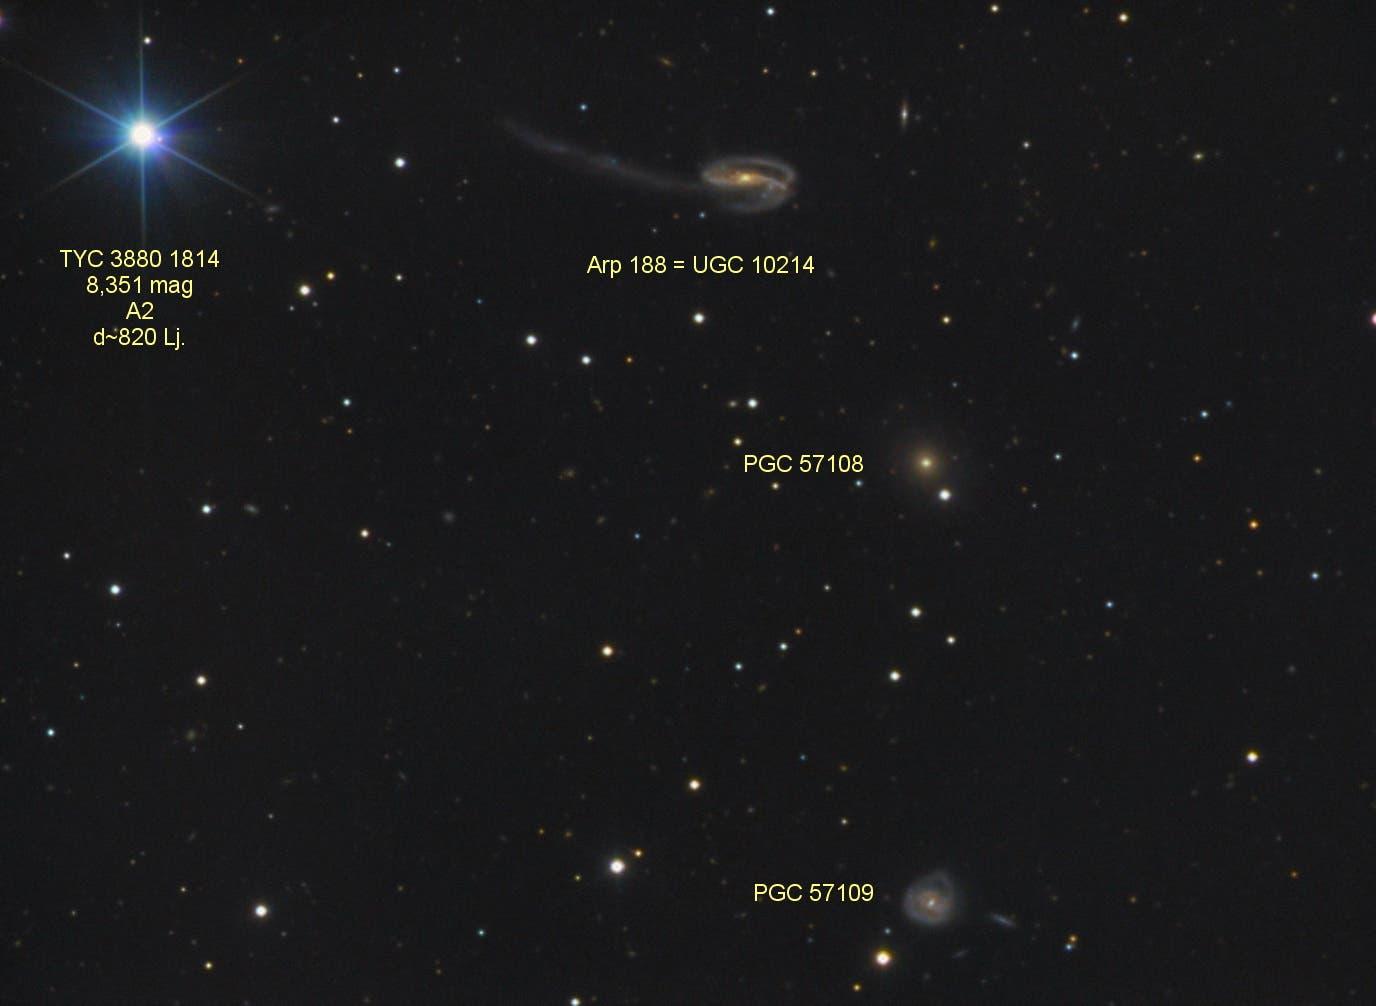 Arp 188 = UGC 10214 Tadpole Galaxy (Text)